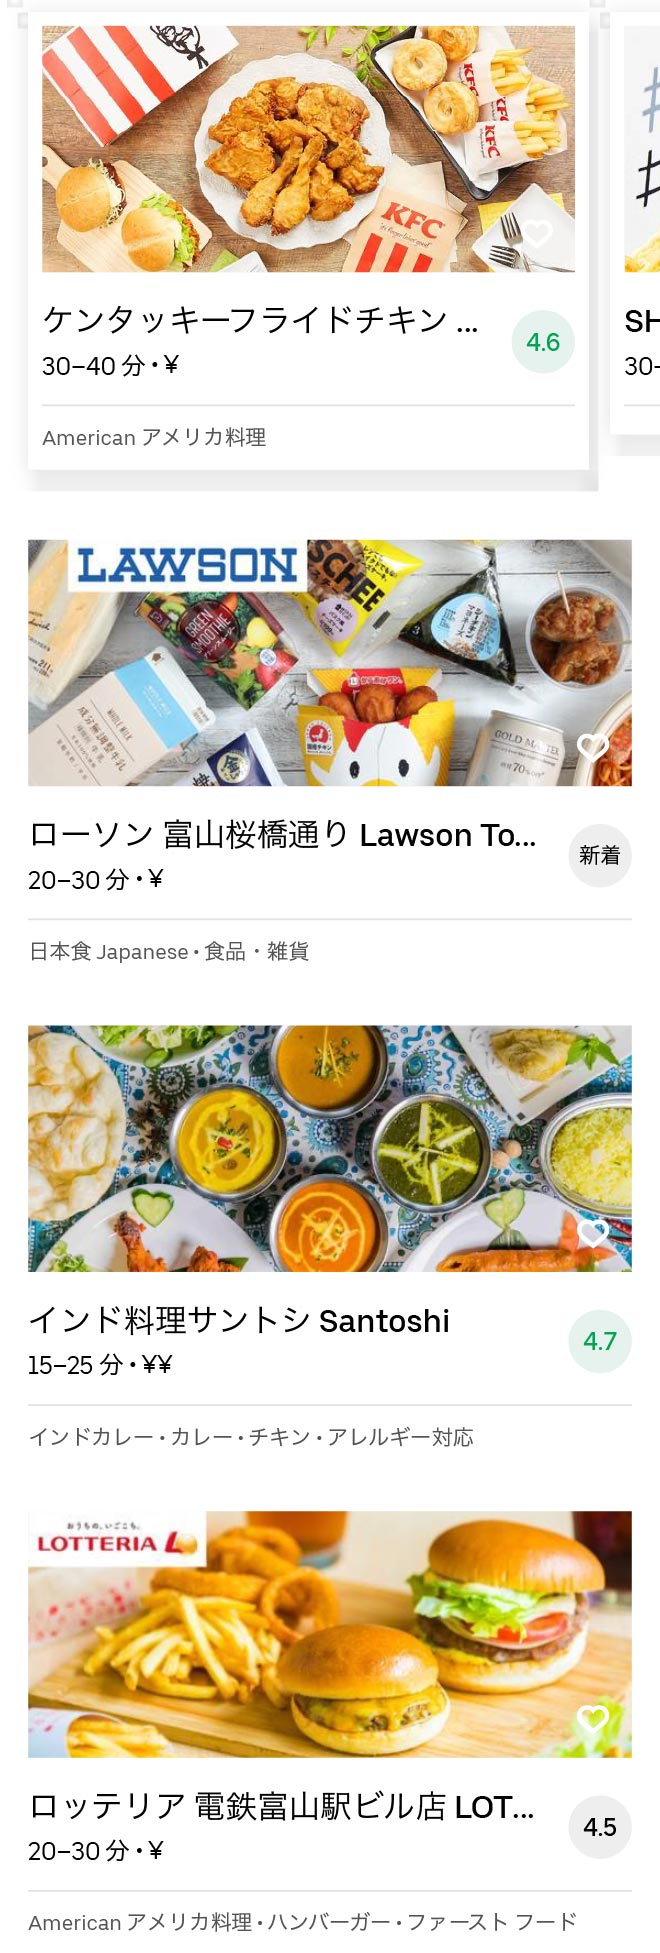 Toyama menu 2009 02